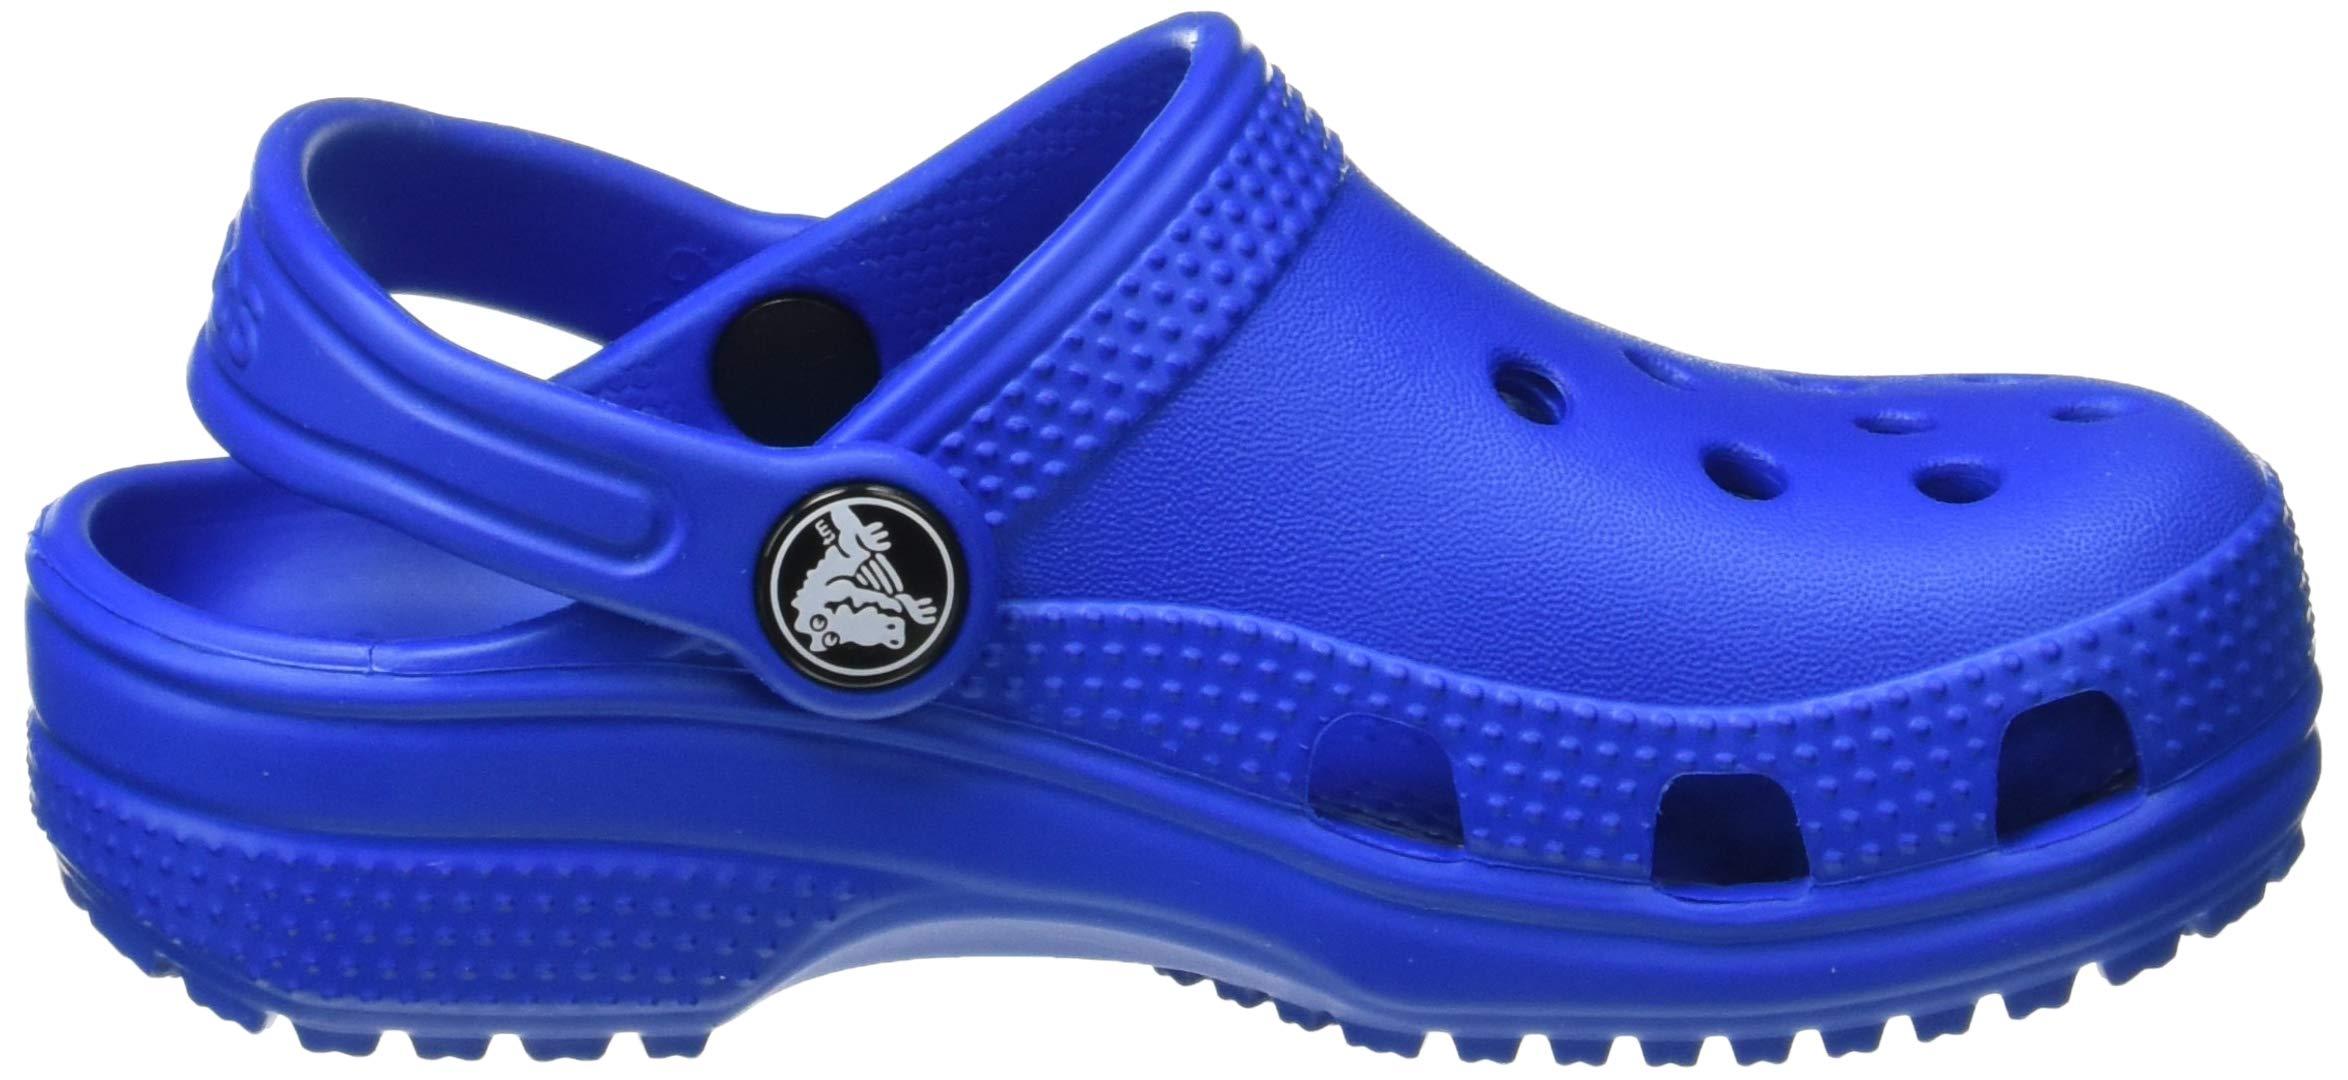 Crocs Classic Clog, Bright Cobalt, 13 M US Little Kid by Crocs (Image #6)